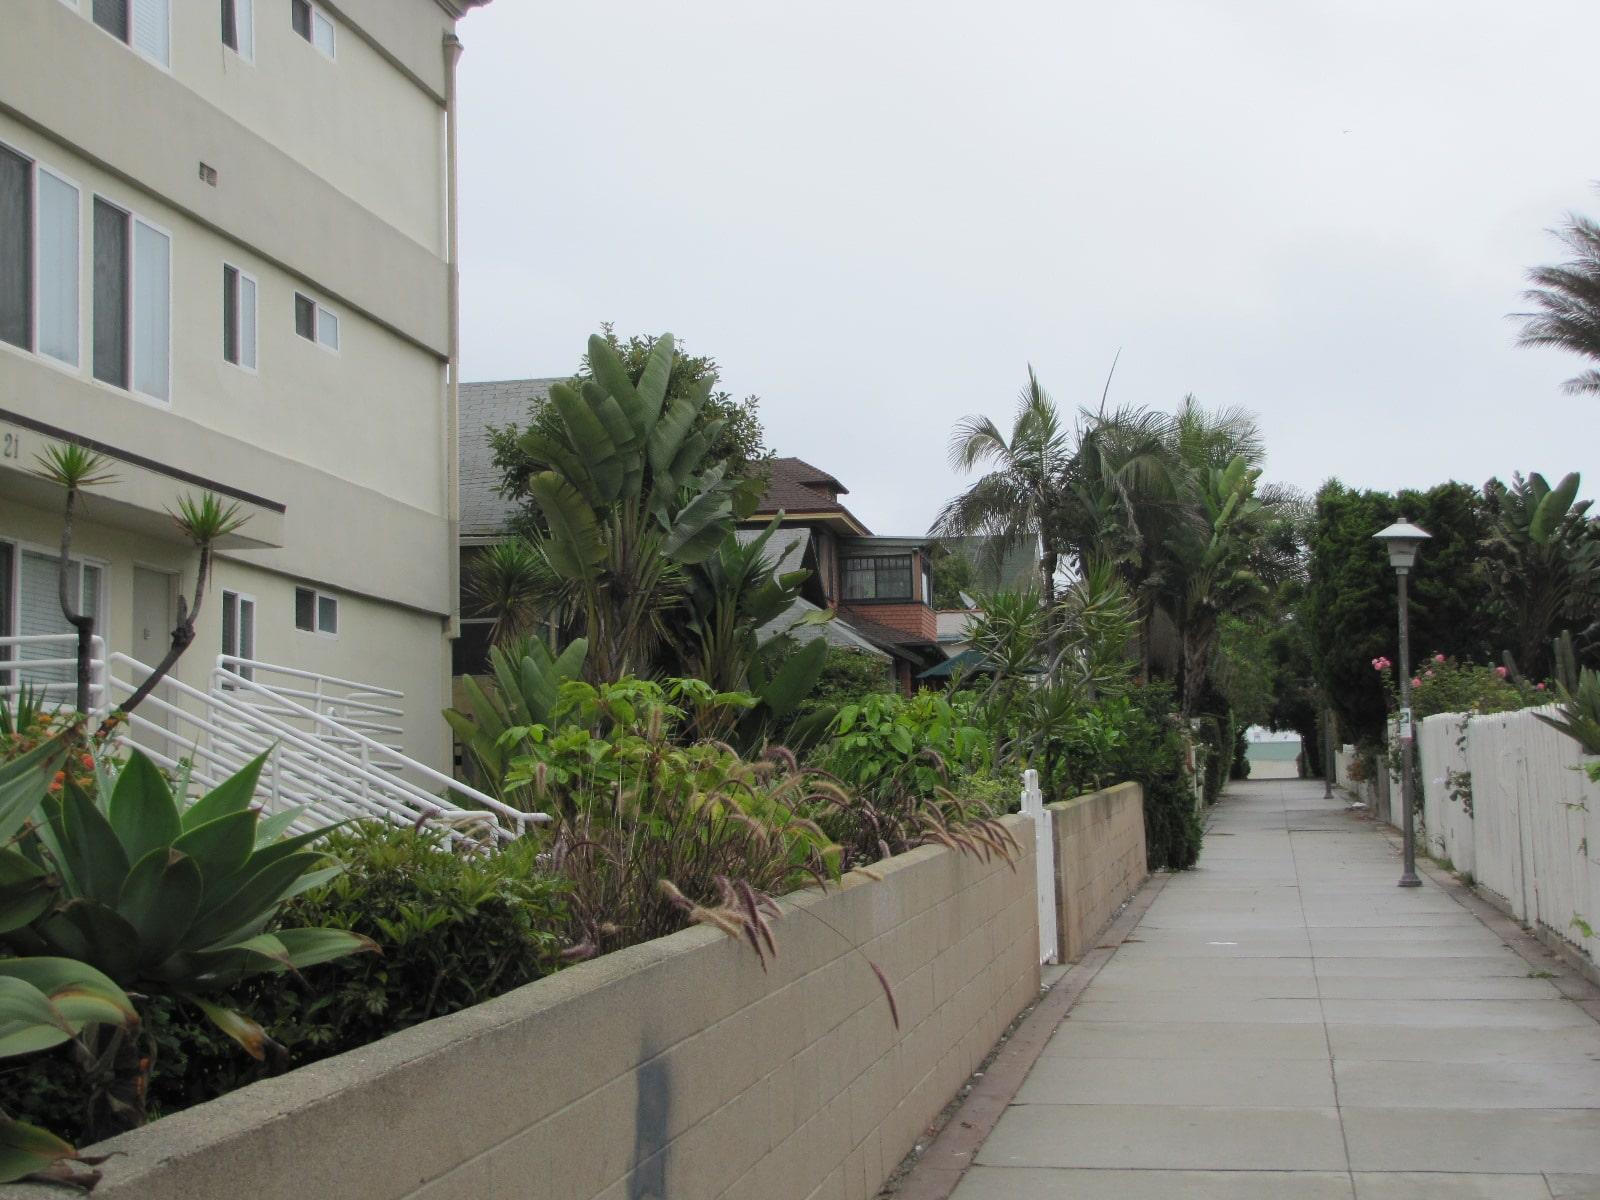 Le quartier de Venice beach